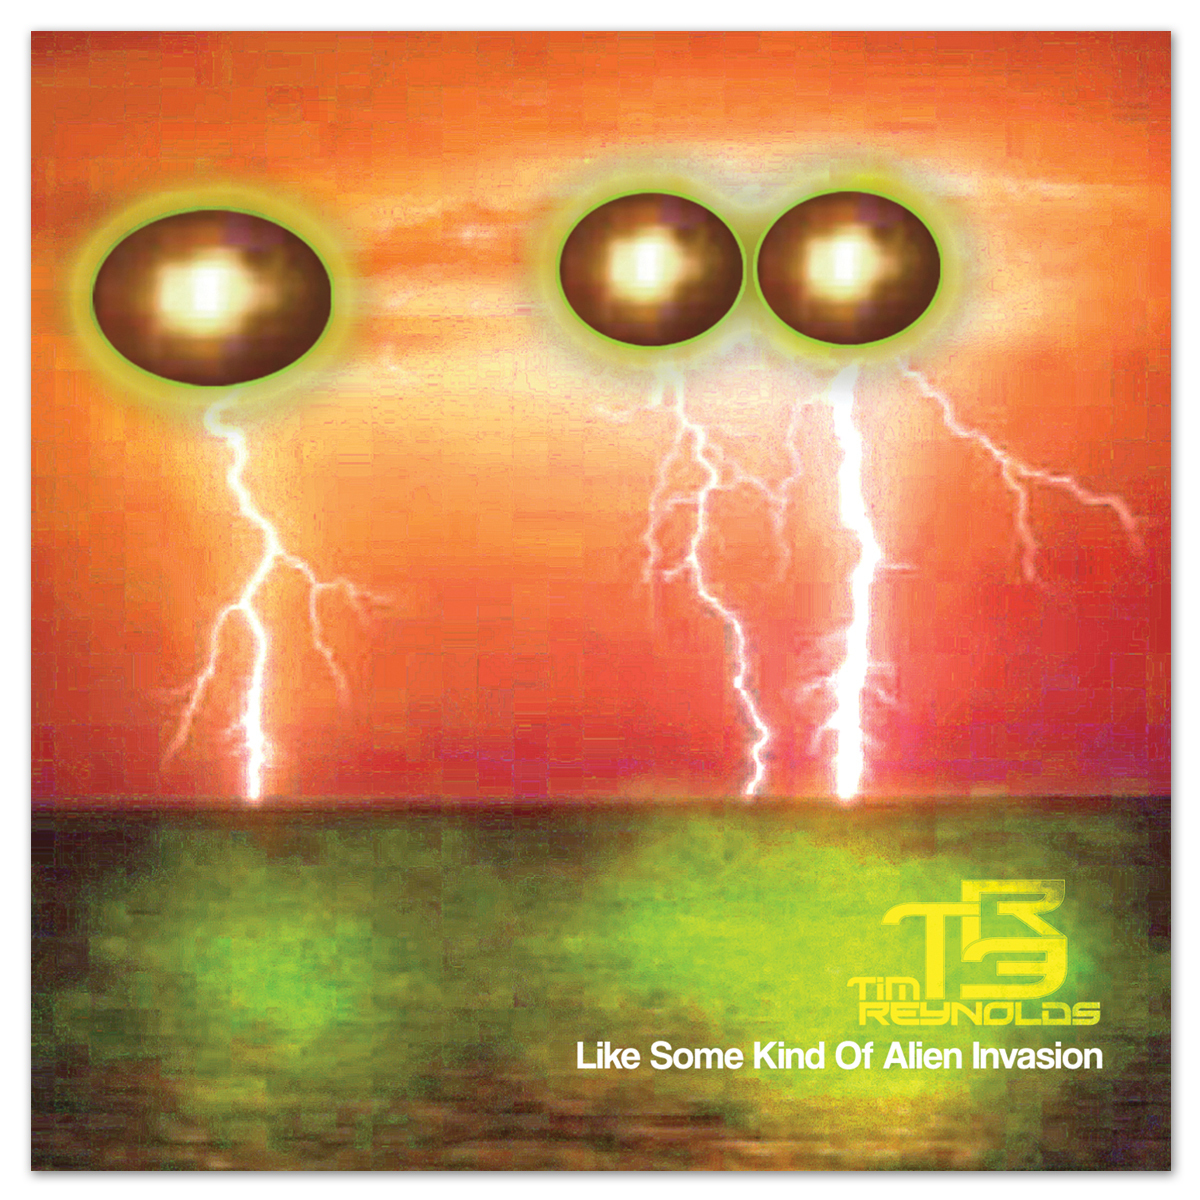 TR3 feat. Tim Reynolds 'Like Some Kind of Alien Invasion' CD